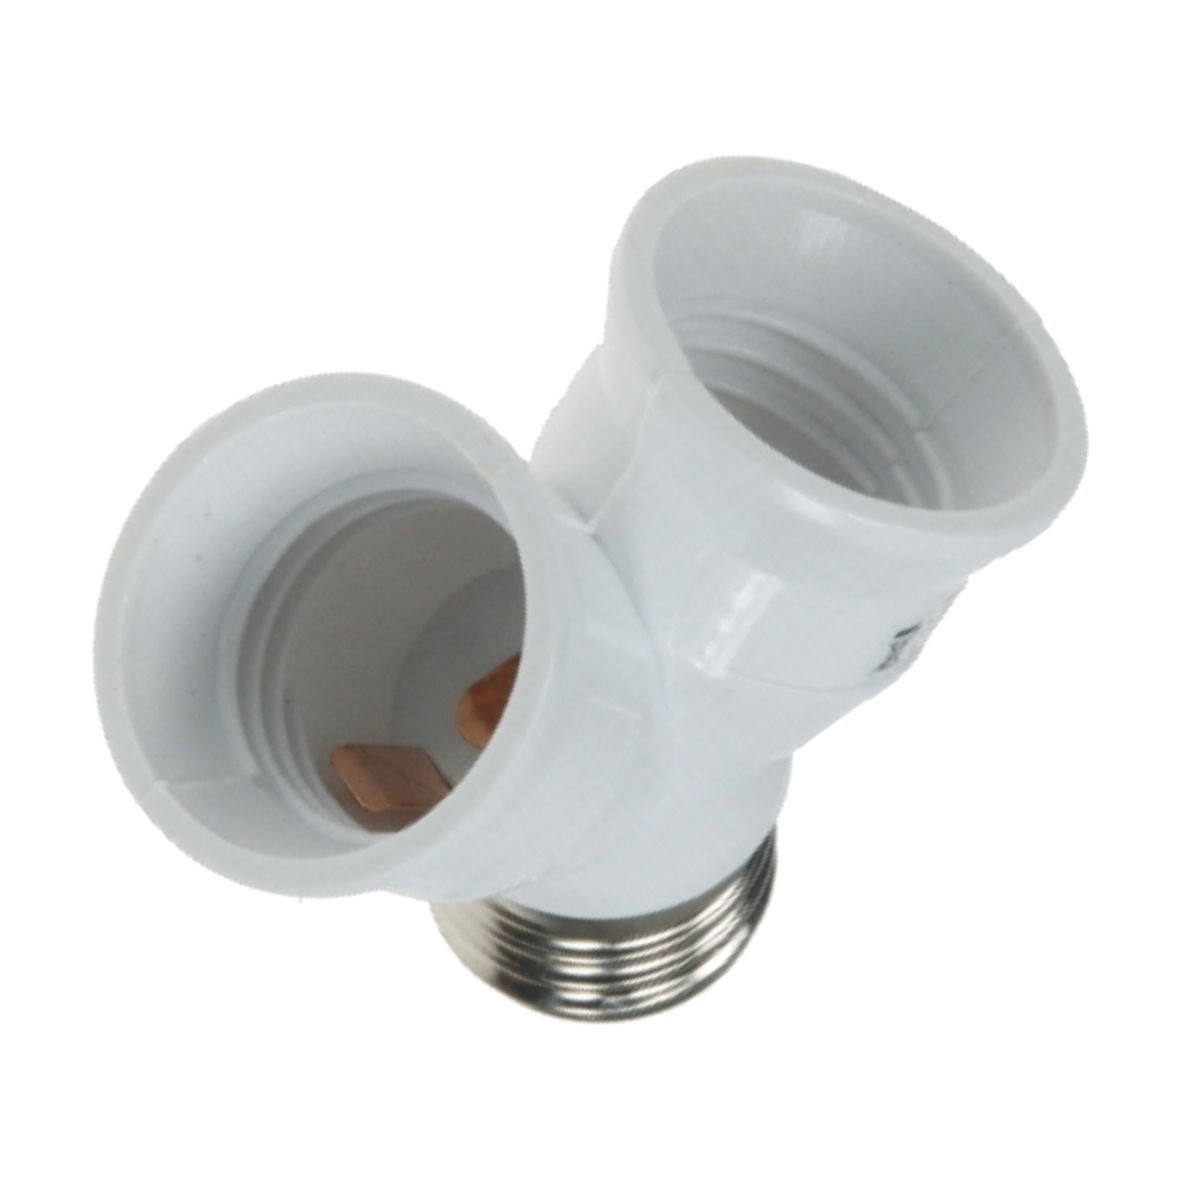 fassung adapter konverter halterung lampen sockel e27 e14. Black Bedroom Furniture Sets. Home Design Ideas